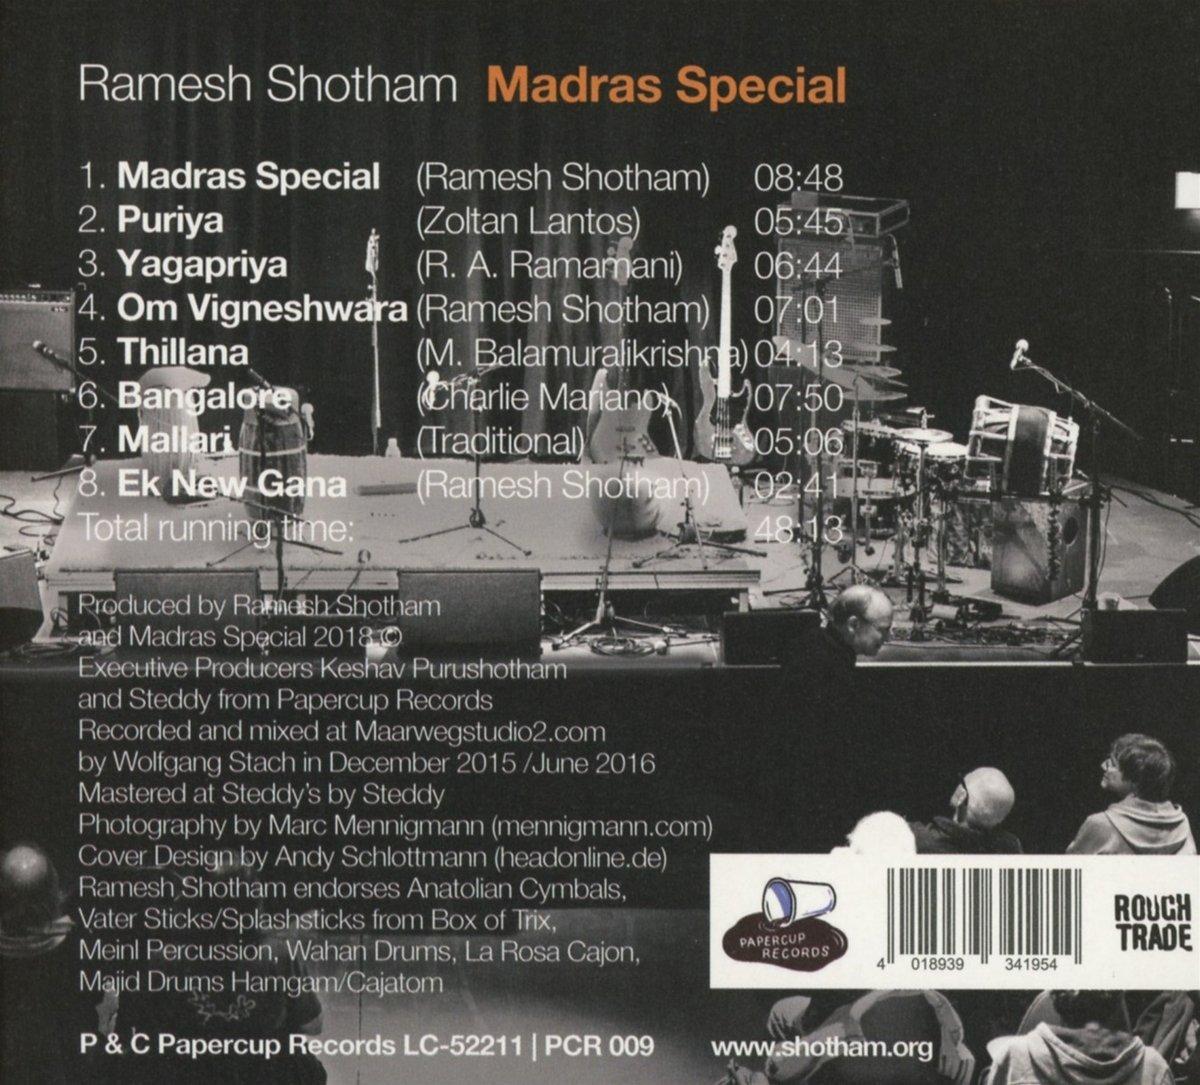 Here It Is! - Ramesh Shotham Madras Special: Amazon.de: Musik